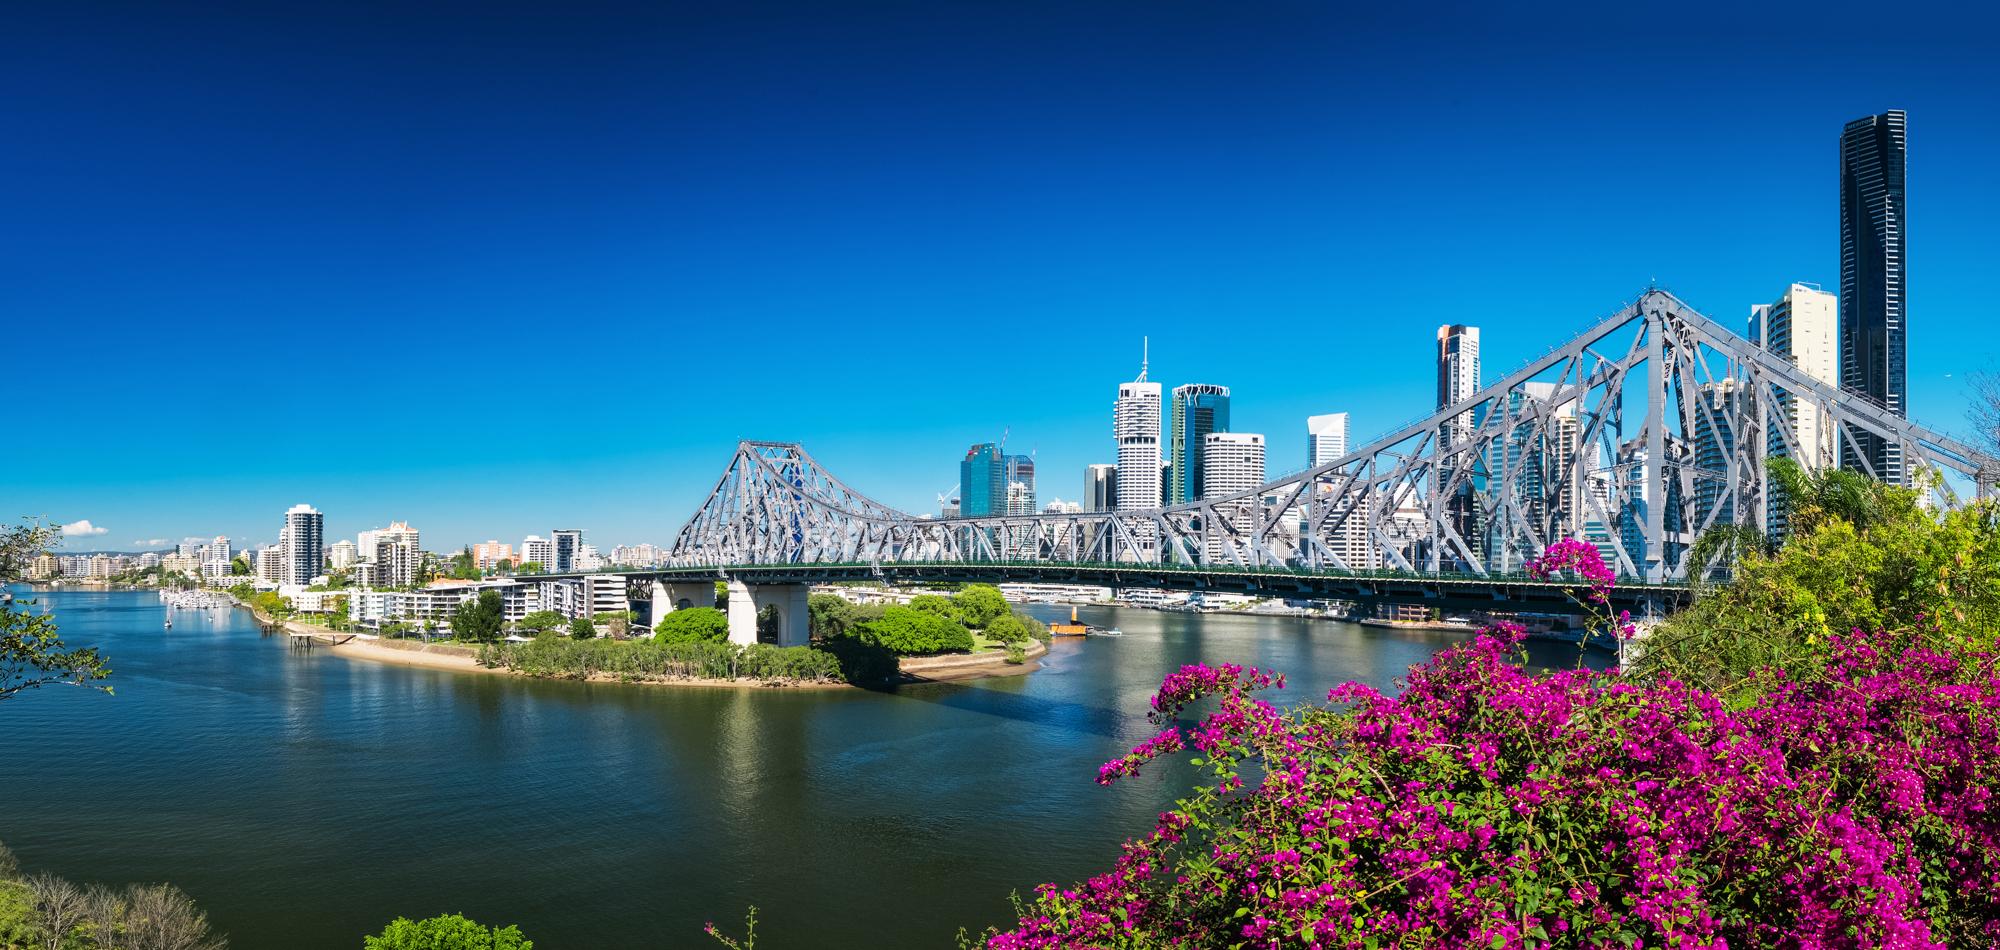 Story bridge healthpathways main image WEB RGB